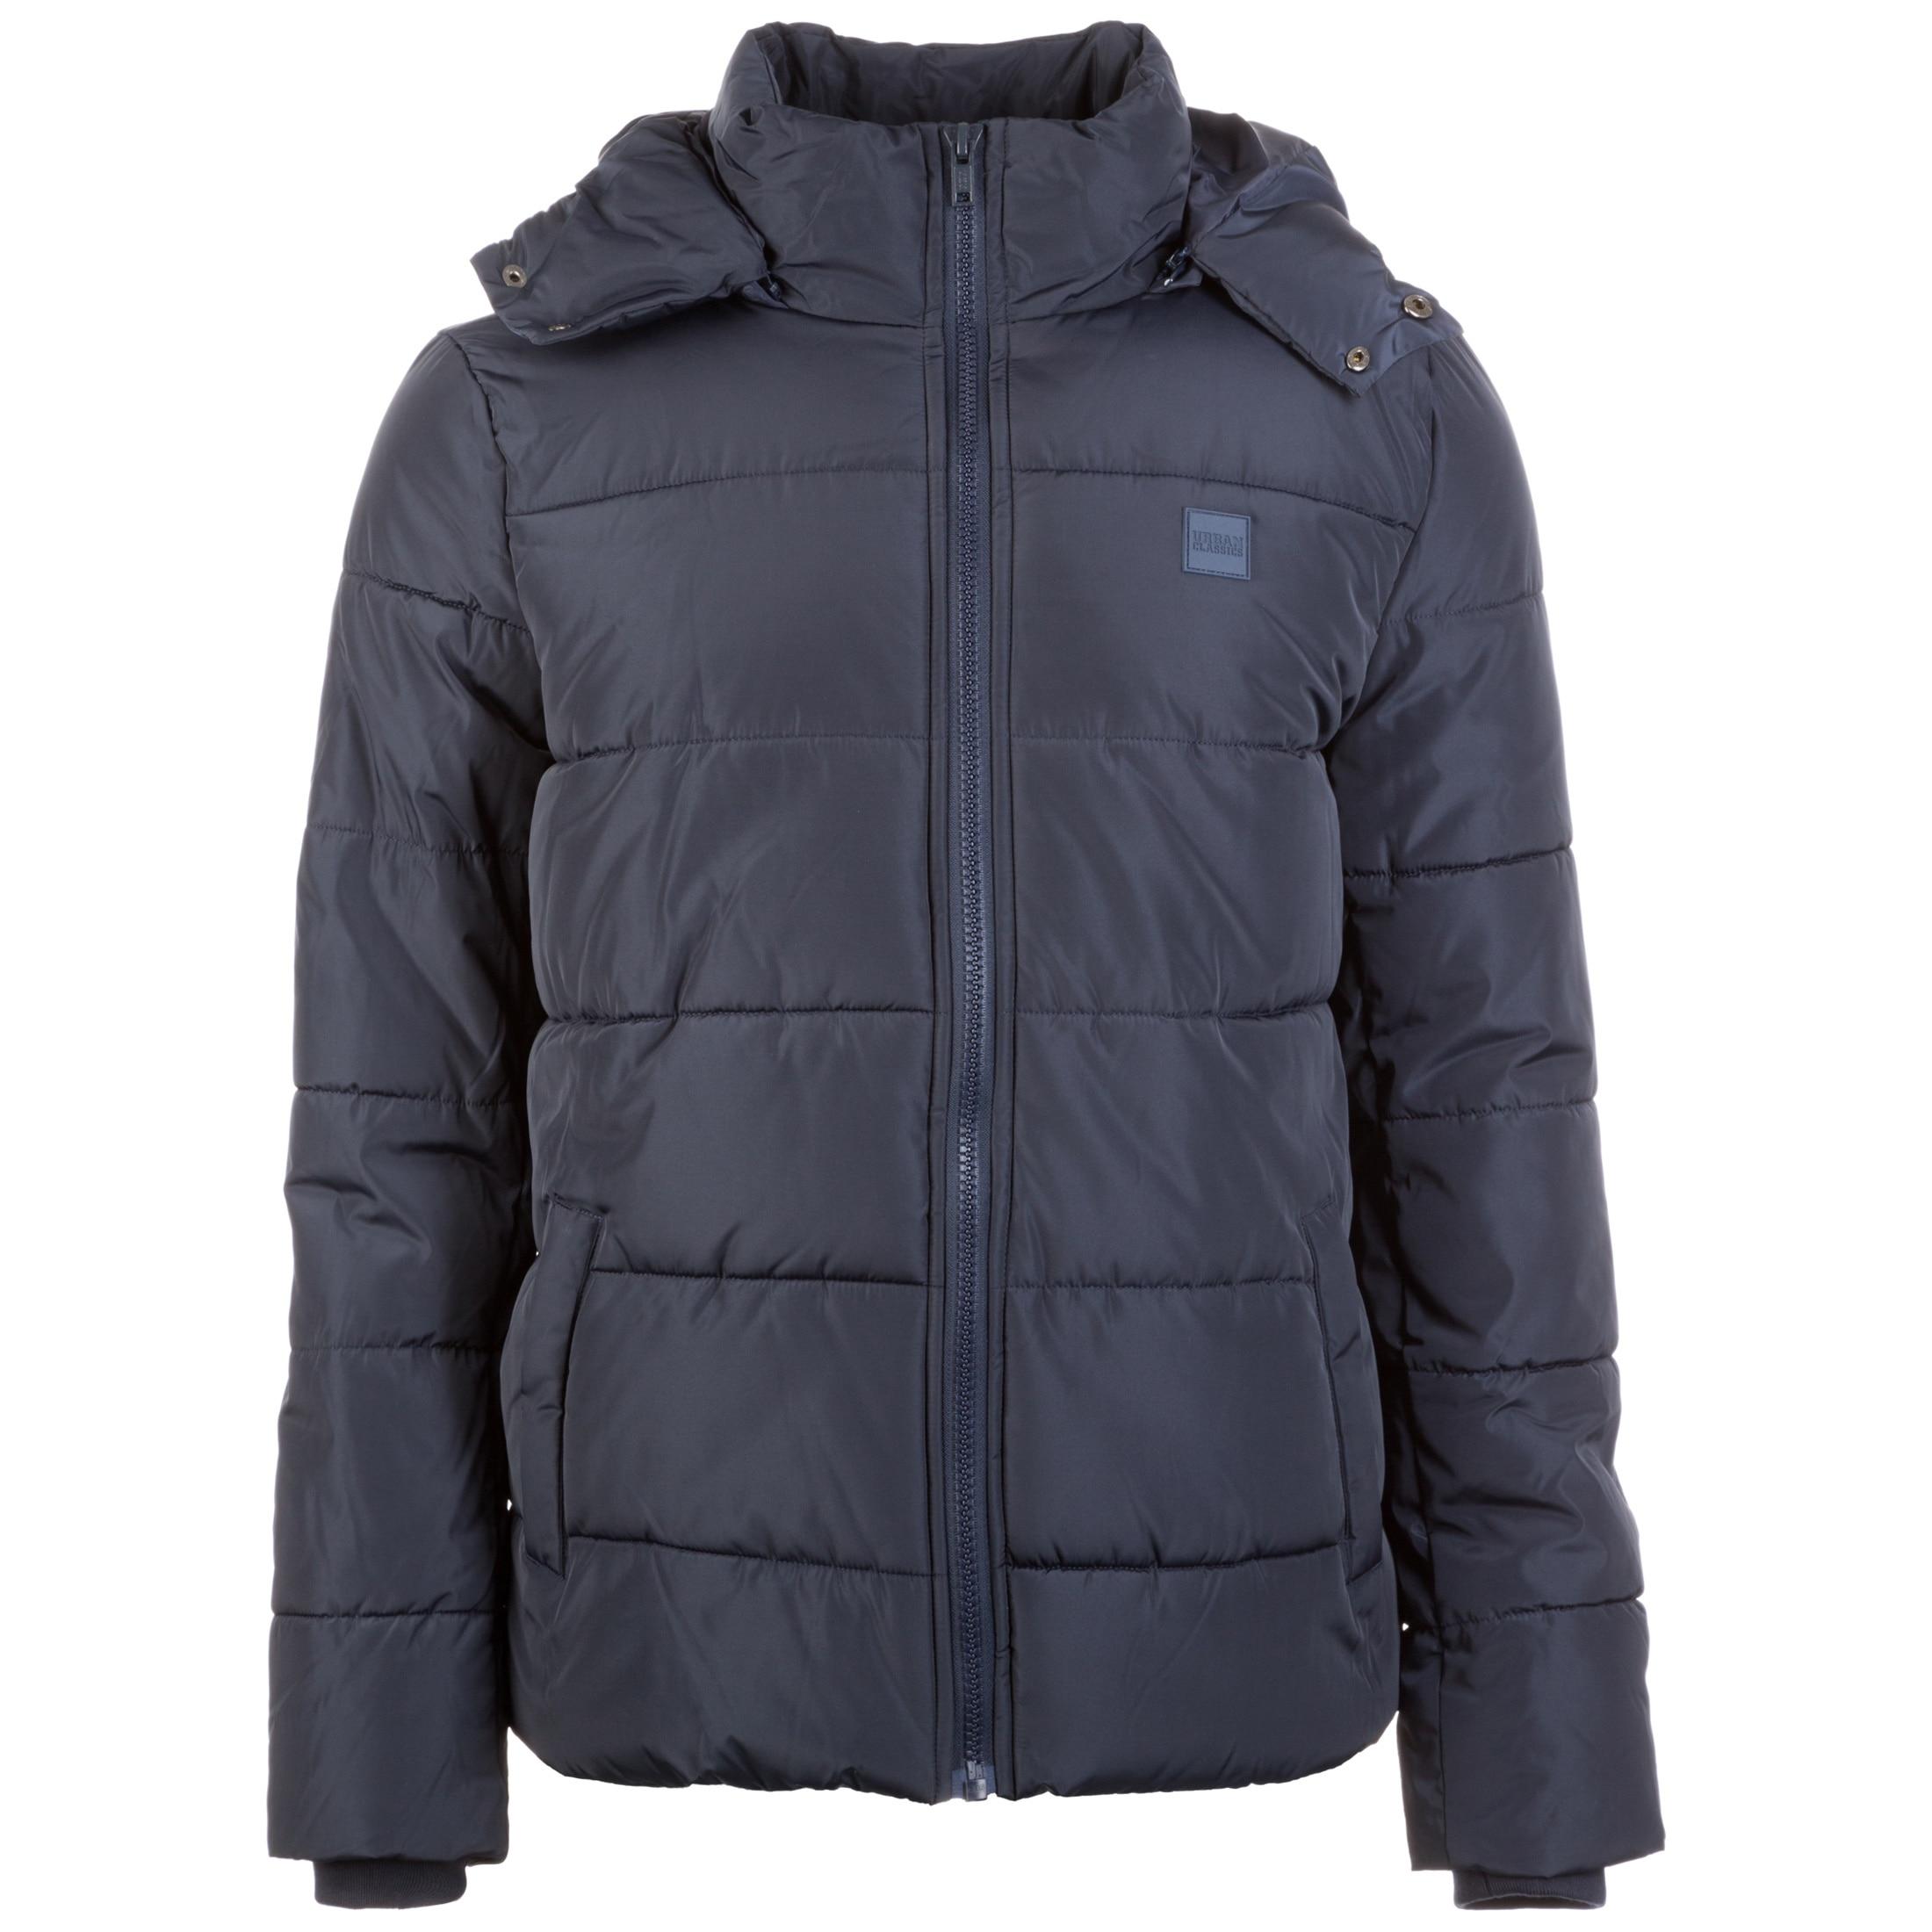 URBAN CLASSICS Winterjacke Hooded Puffer blau Herren Übergangsjacken